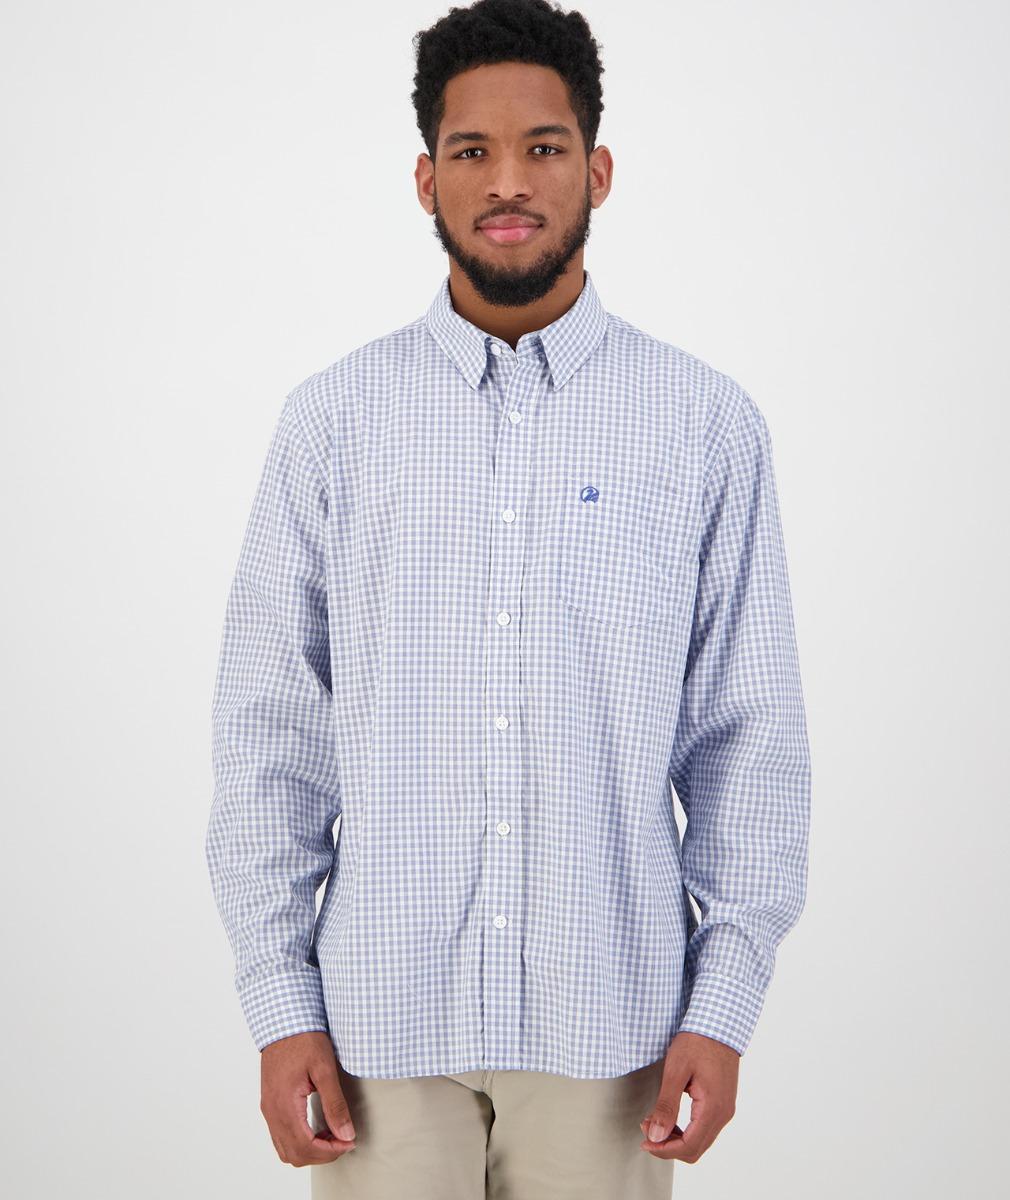 Swanndri Men's Stamford Shirt in Blue